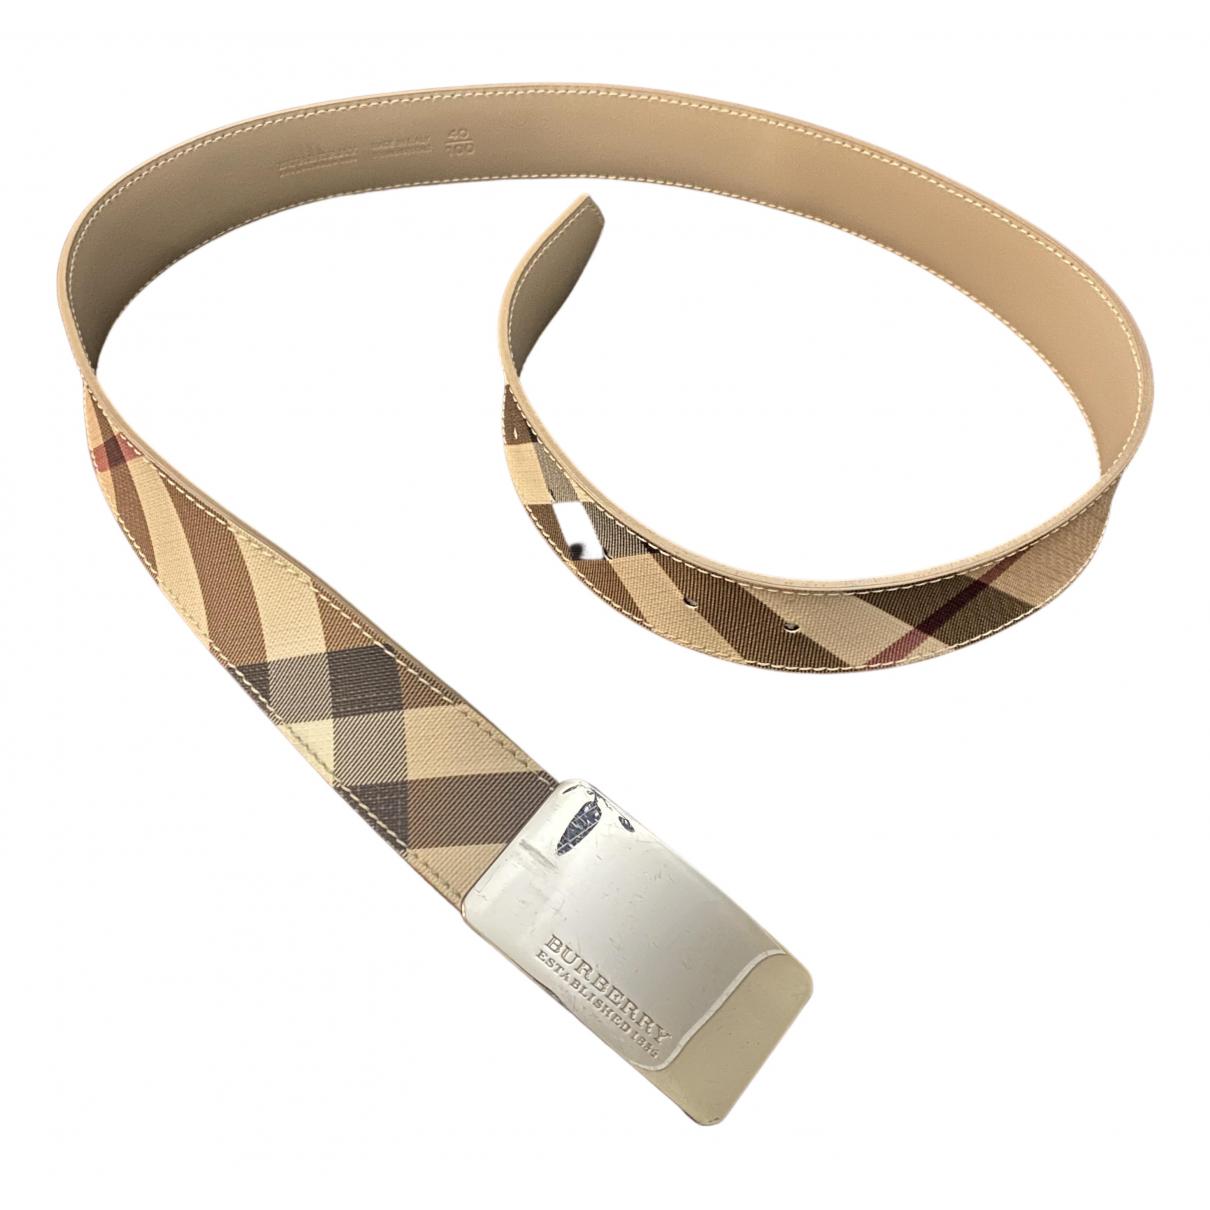 Burberry \N Beige Cloth belt for Women S International